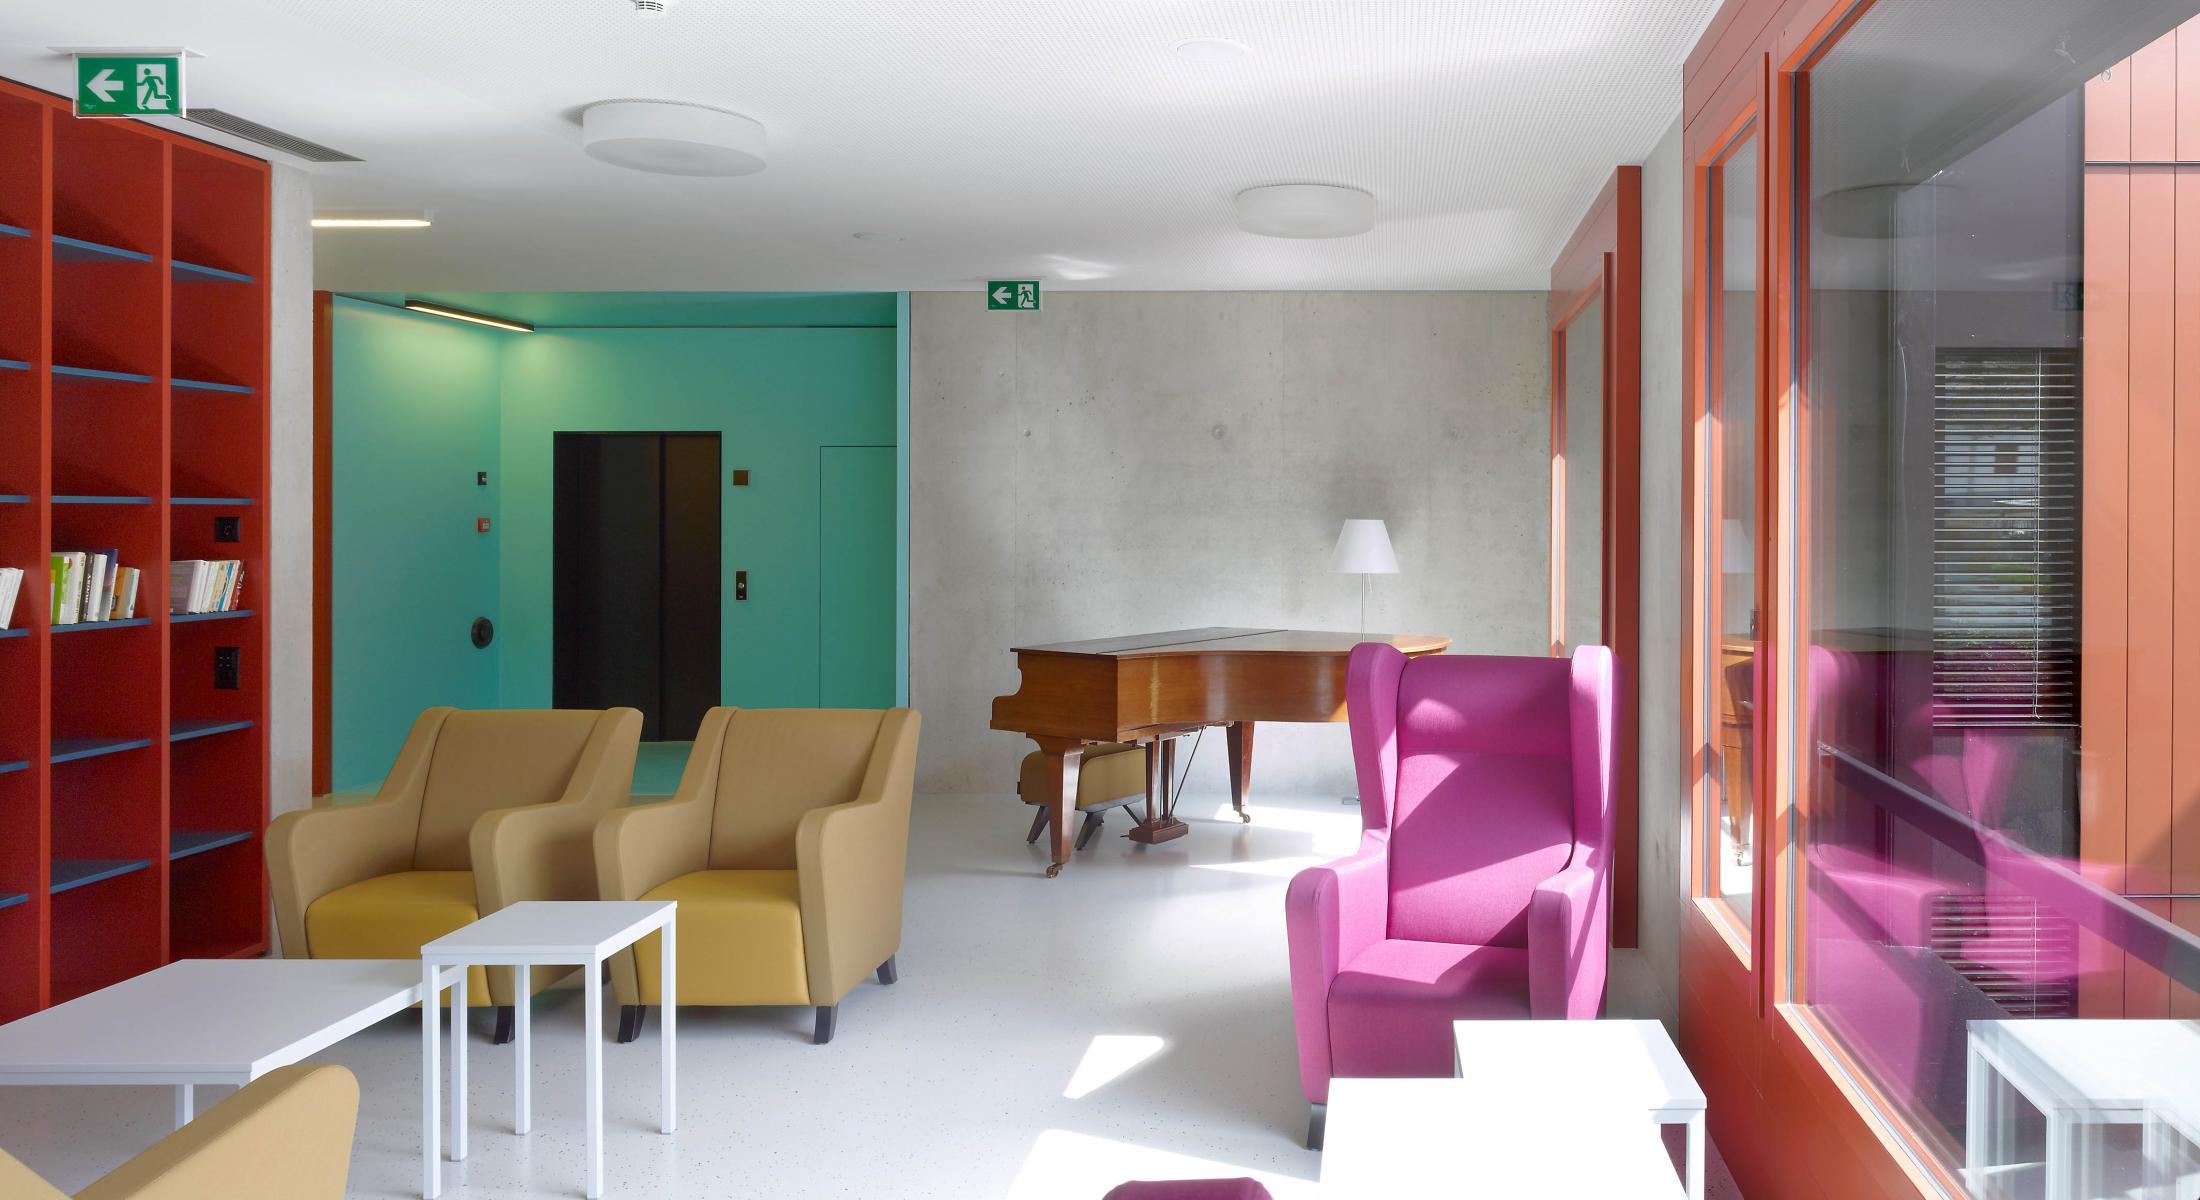 Creating Hospitality - La Charmaie 1 - moments furniture